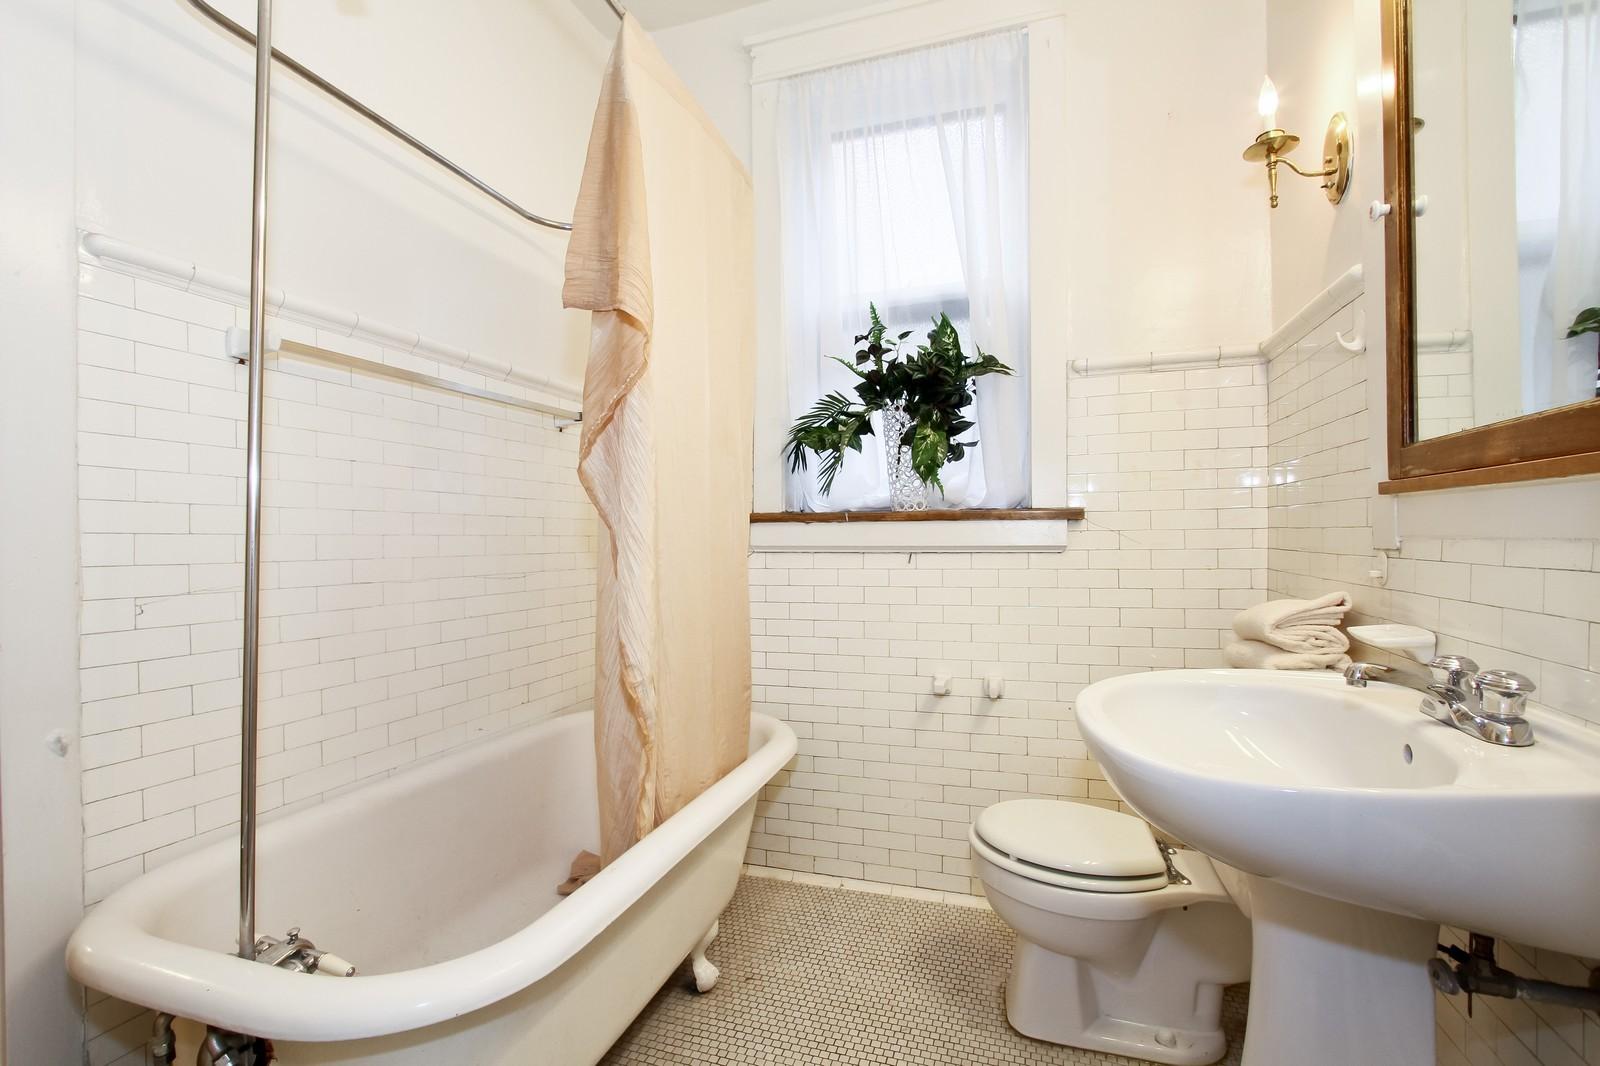 Real Estate Photography - 1648 E 54th St, Chicago, IL, 60615 - Bathroom